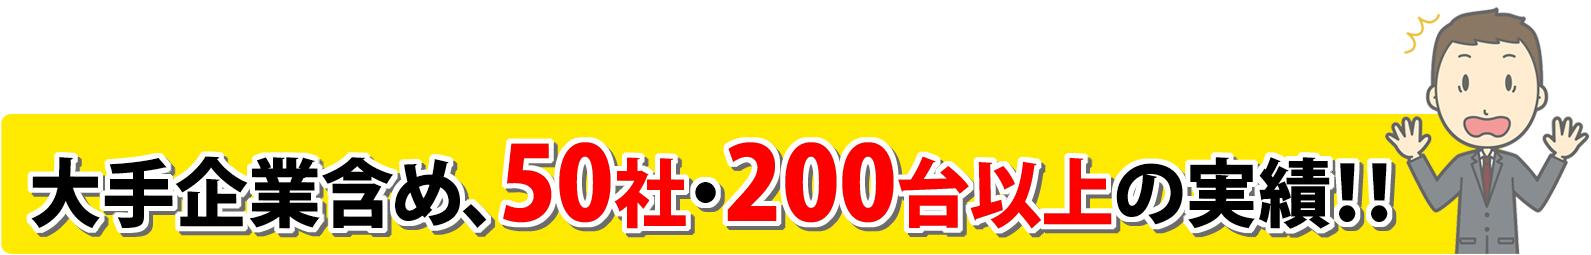 ecomo50社200台以上の実績